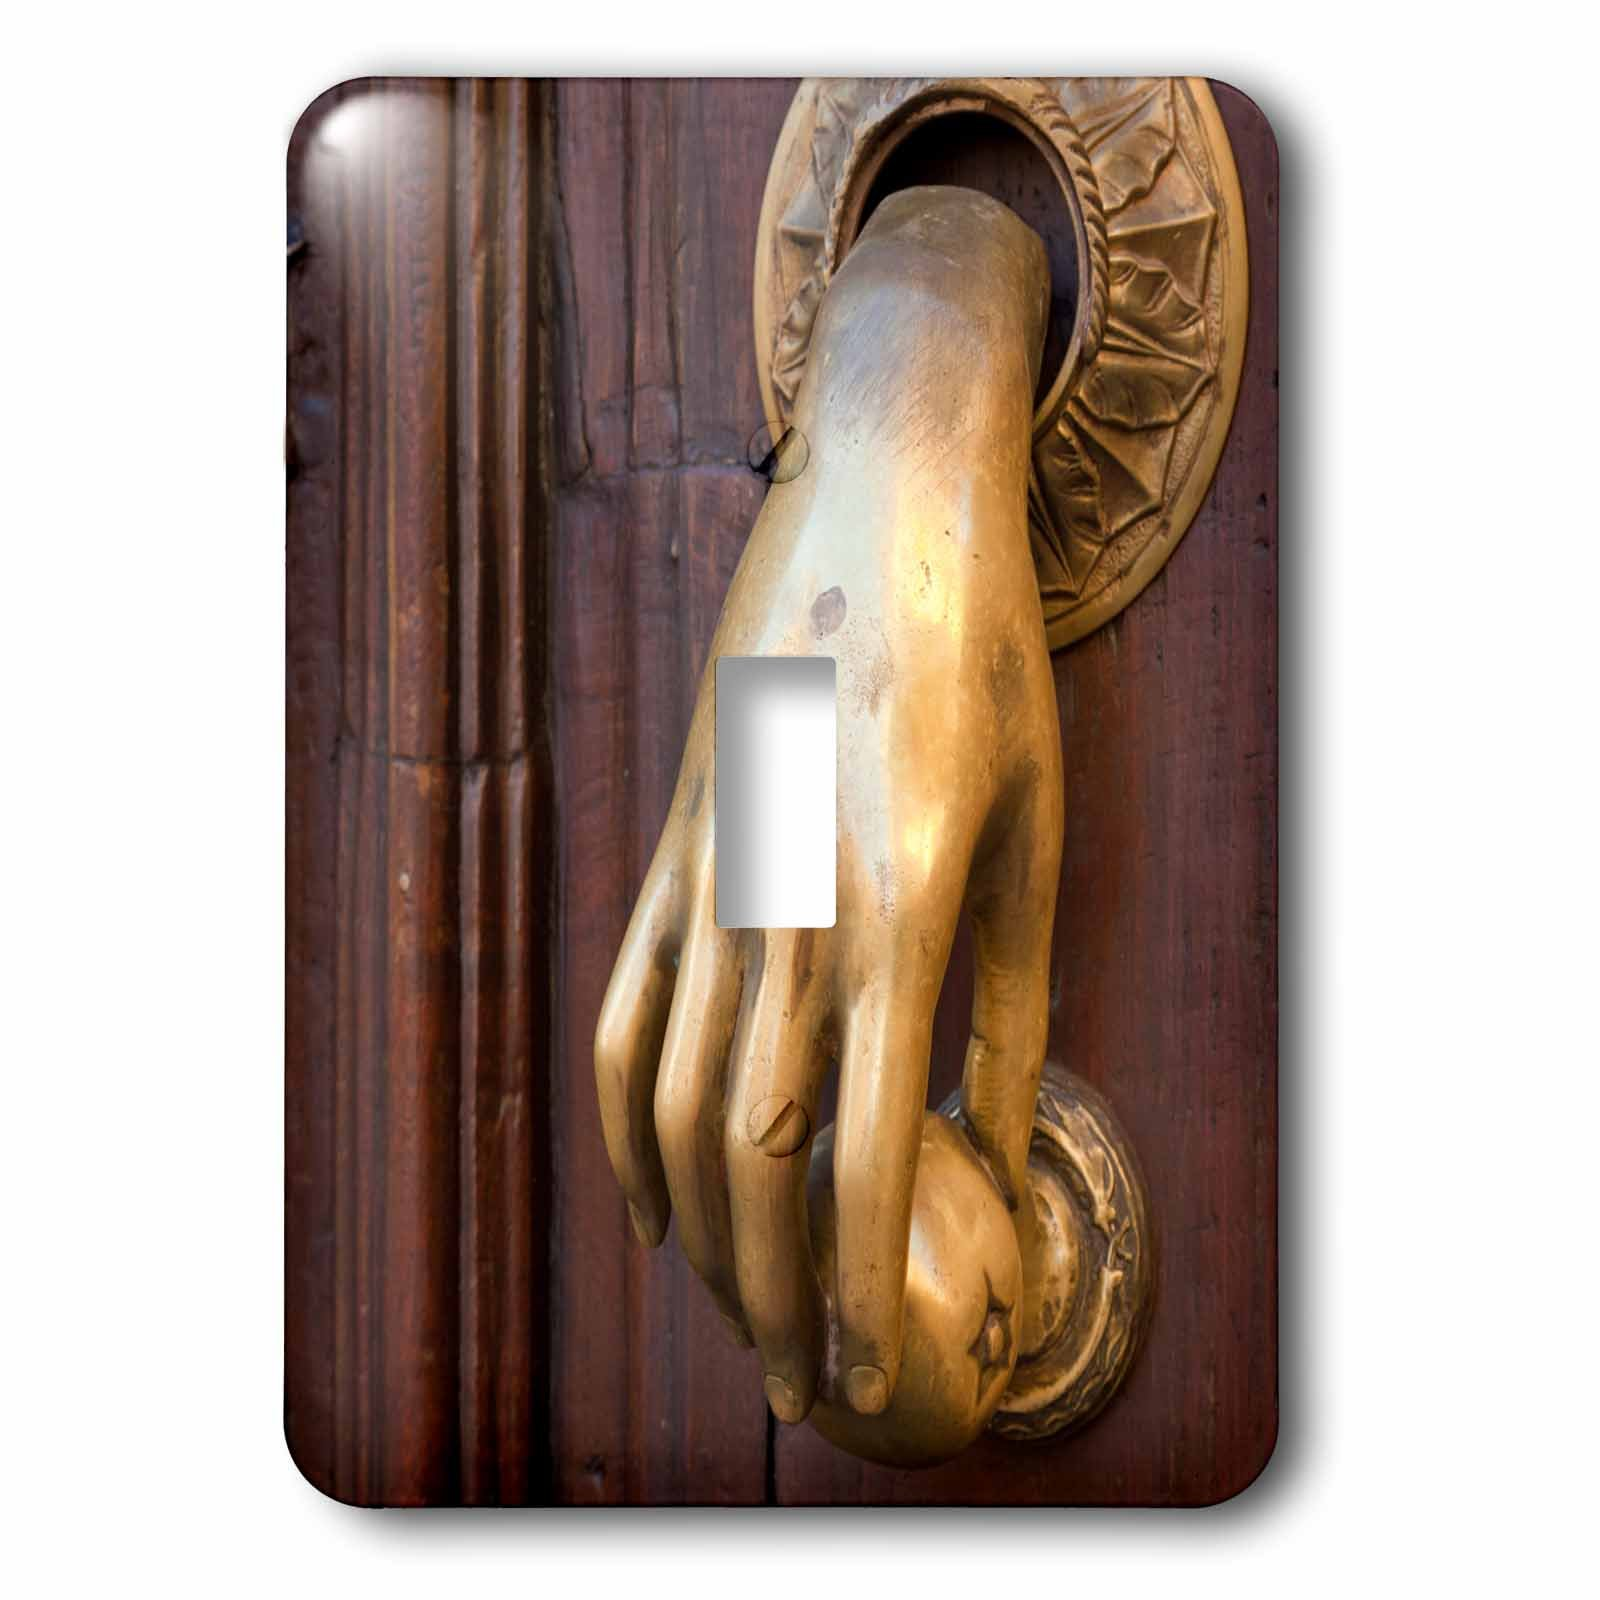 3dRose lsp_188396_1 Mexico, San Miguel De Allende. Detail of A Door and Door Knocker. Single Toggle Switch